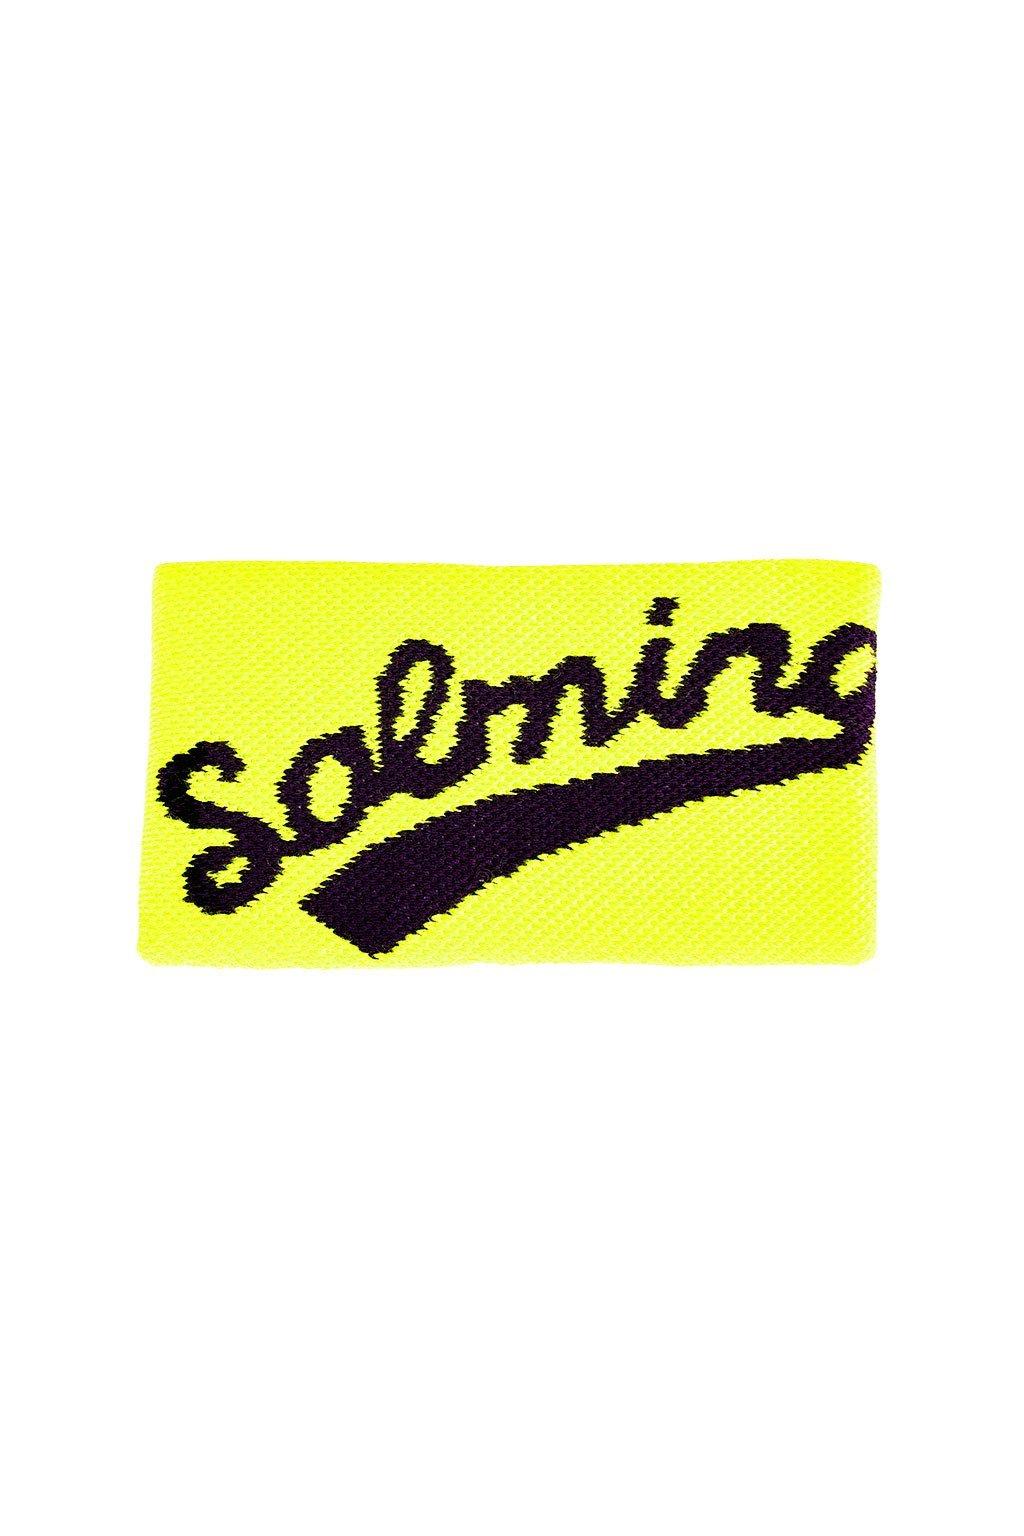 salming wristband long yellow black